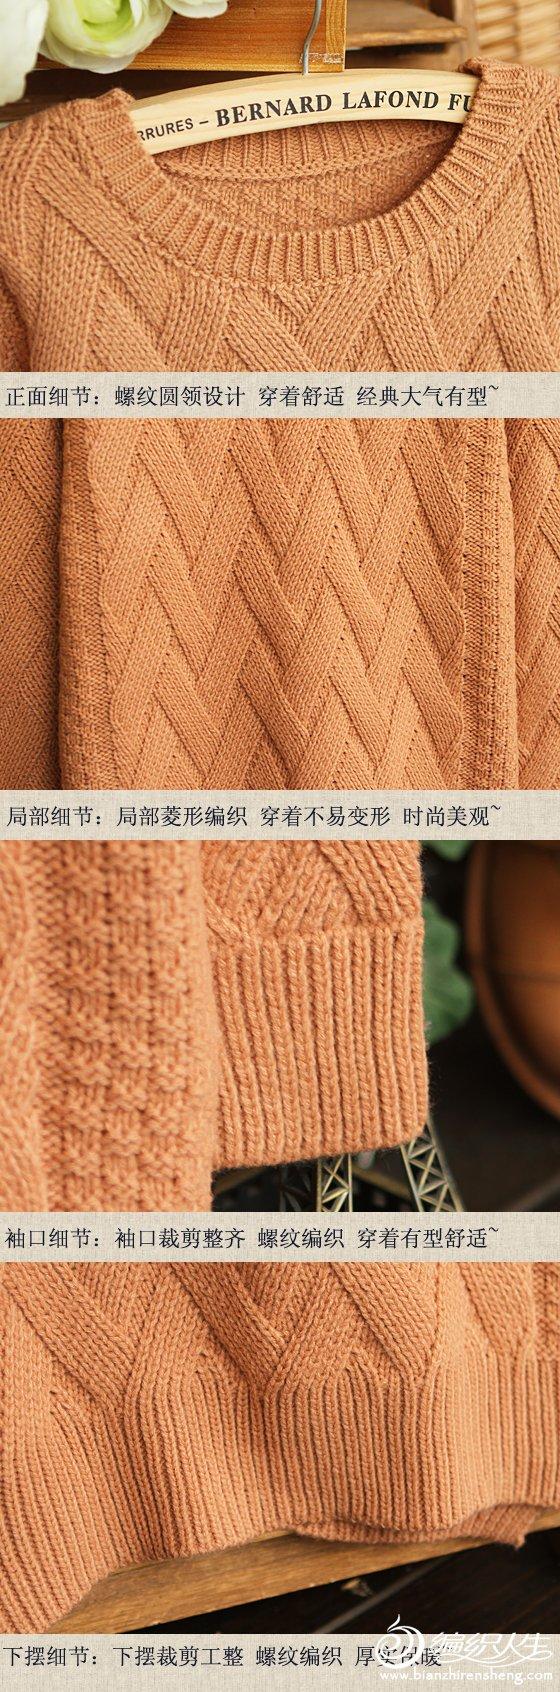 网格状毛衣2.jpg